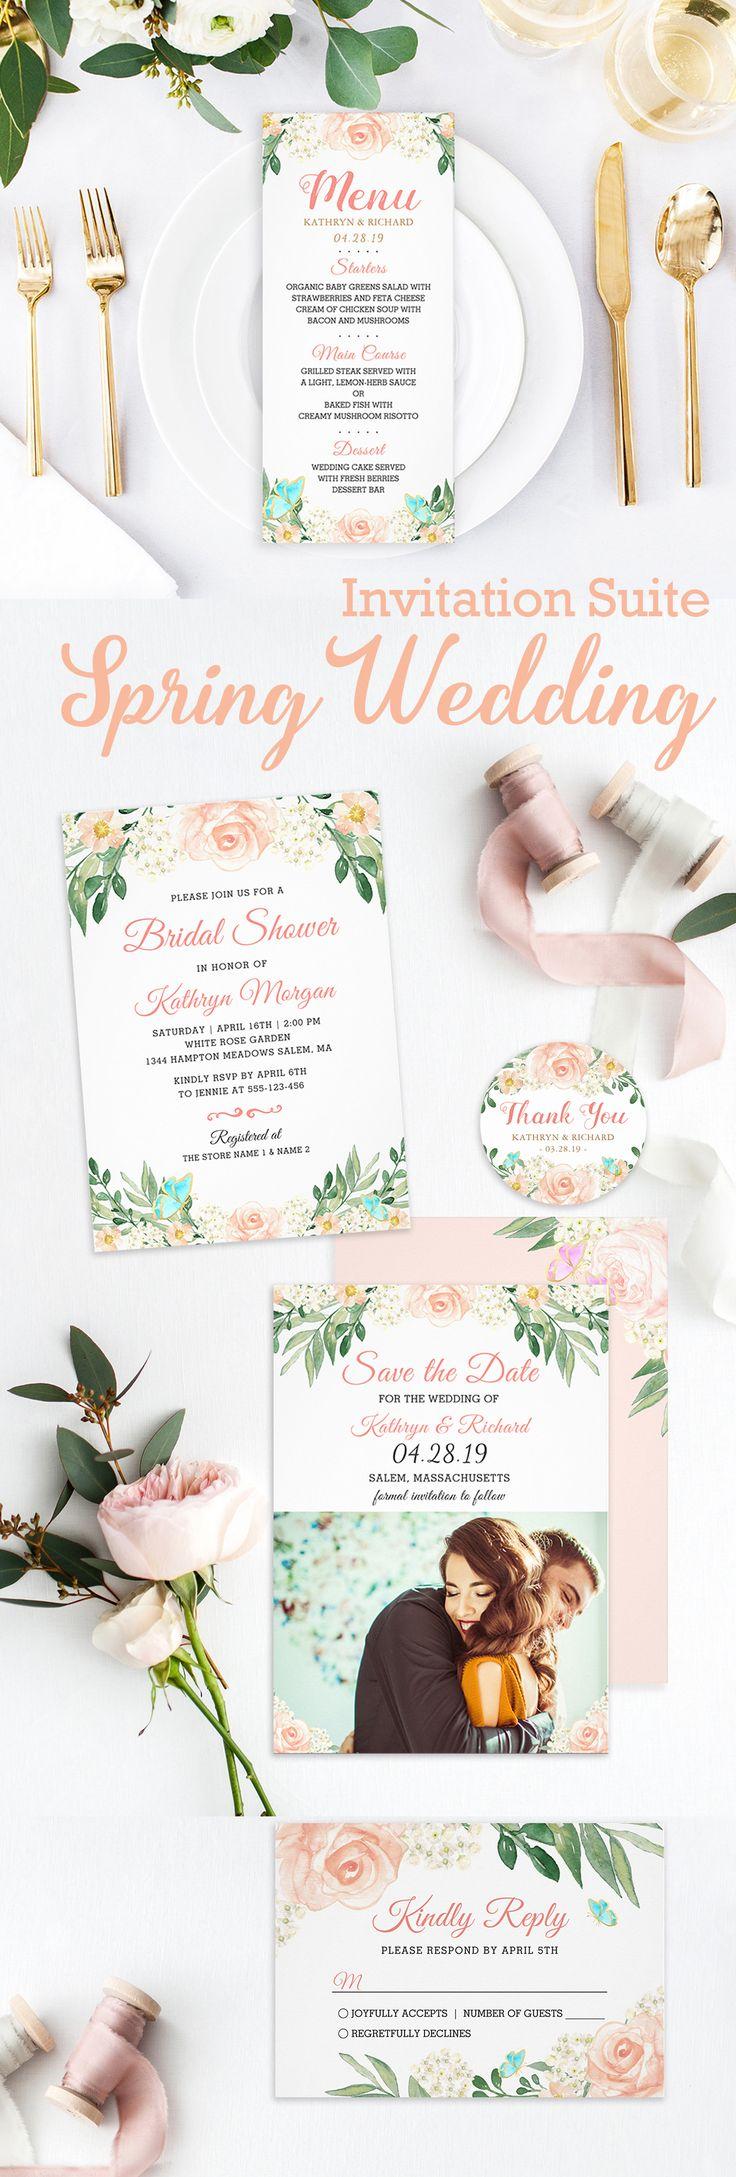 wildflower wedding invitation templates%0A basic resume template free